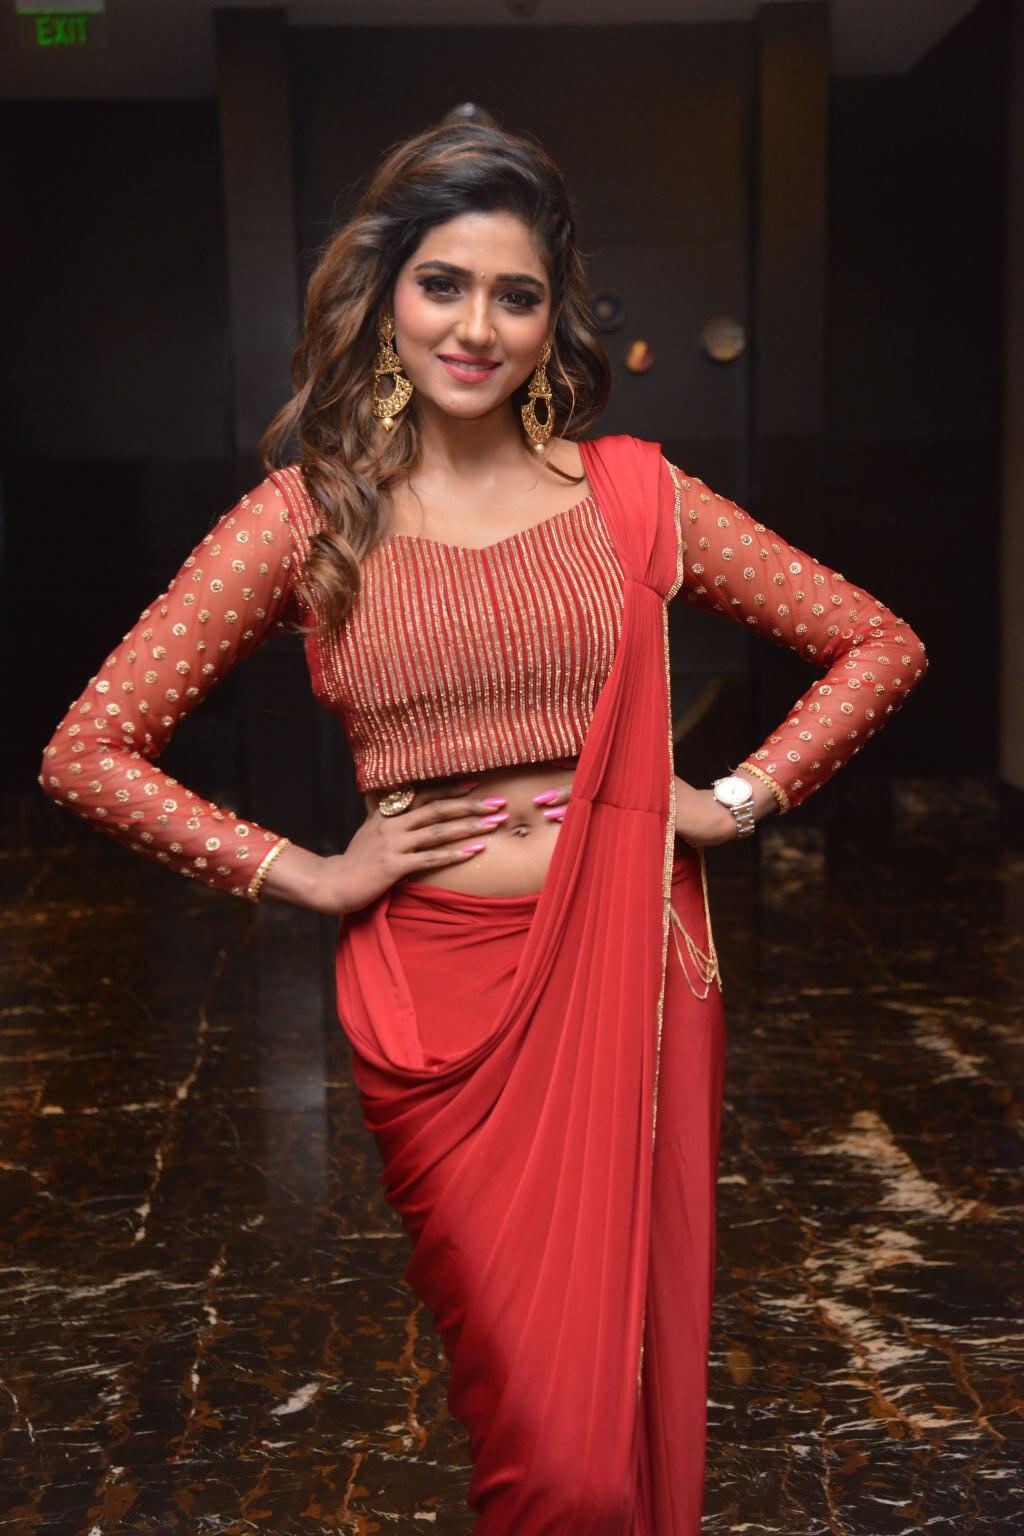 Dollysha aka Shalu Chaurasia